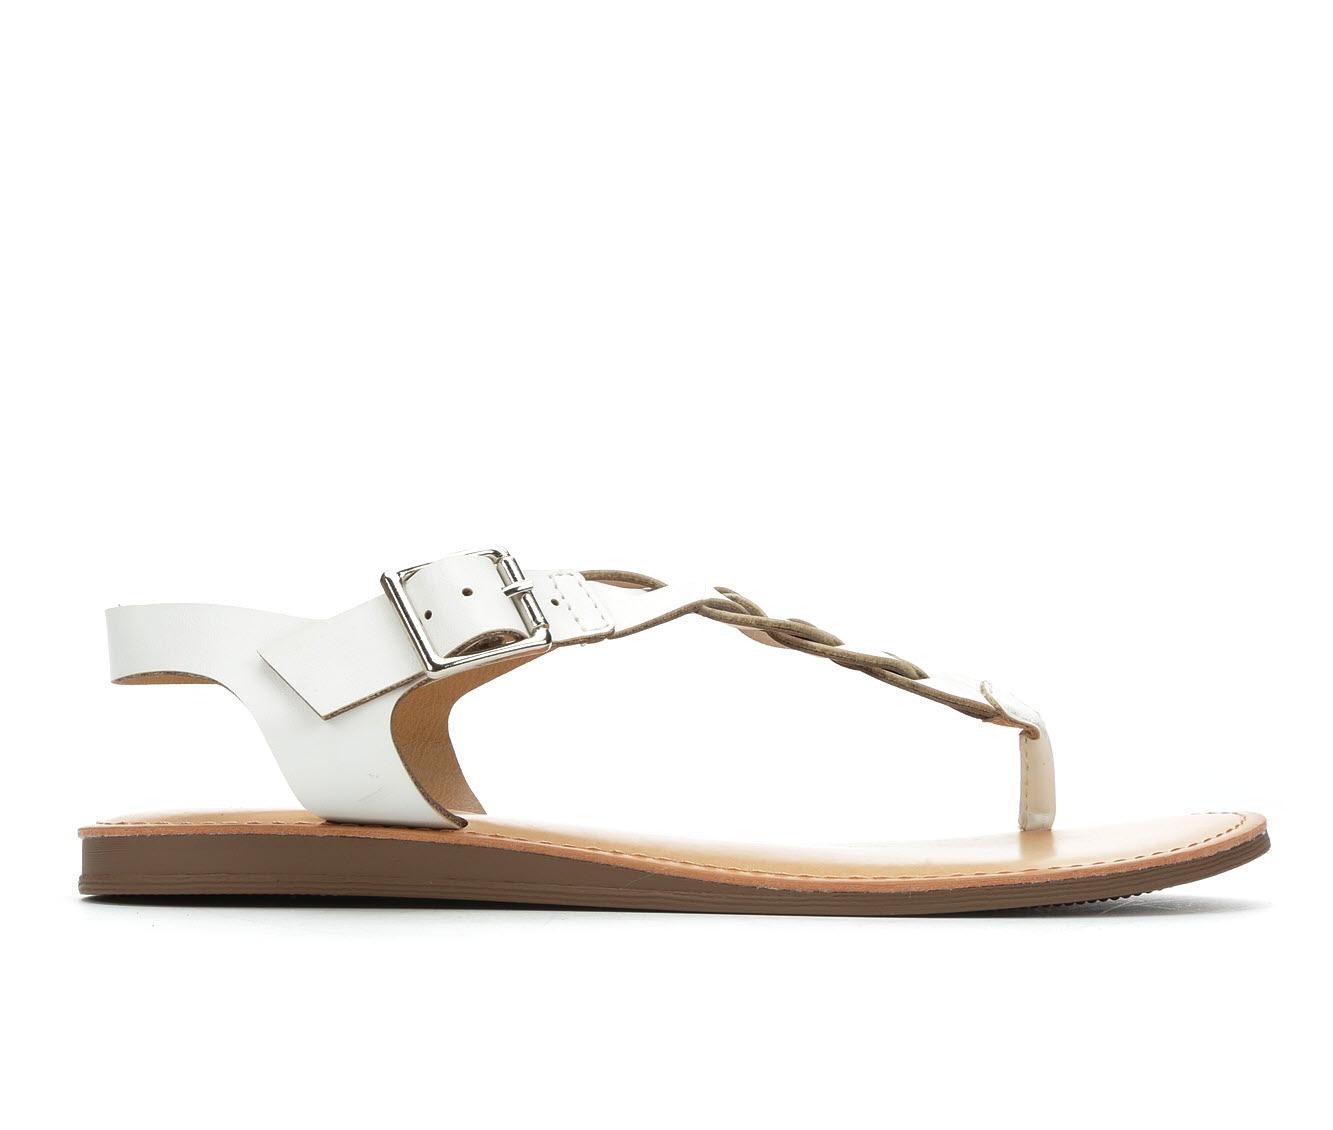 Solanz Actual Women's Sandal (White Faux Leather)